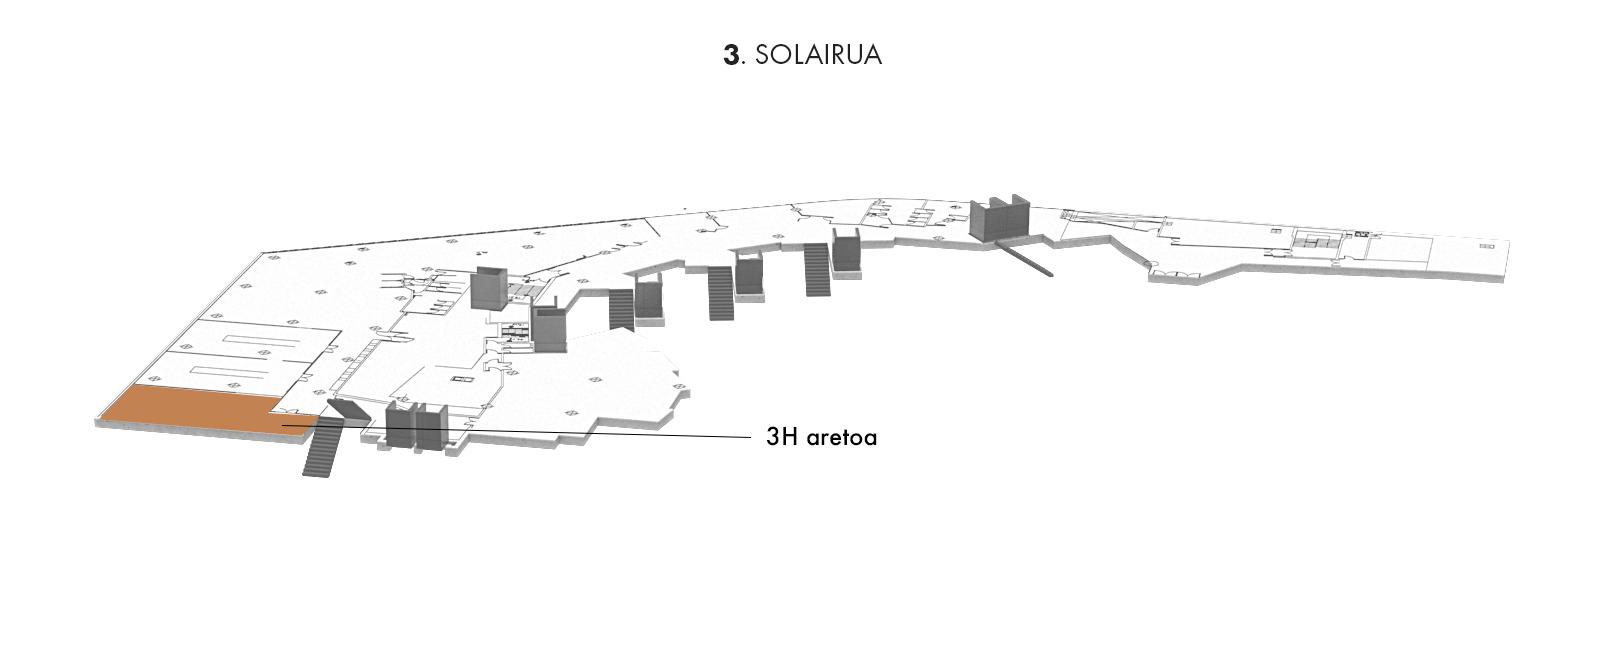 3H aretoa, 3. solairua | Palacio Euskalduna Jauregia